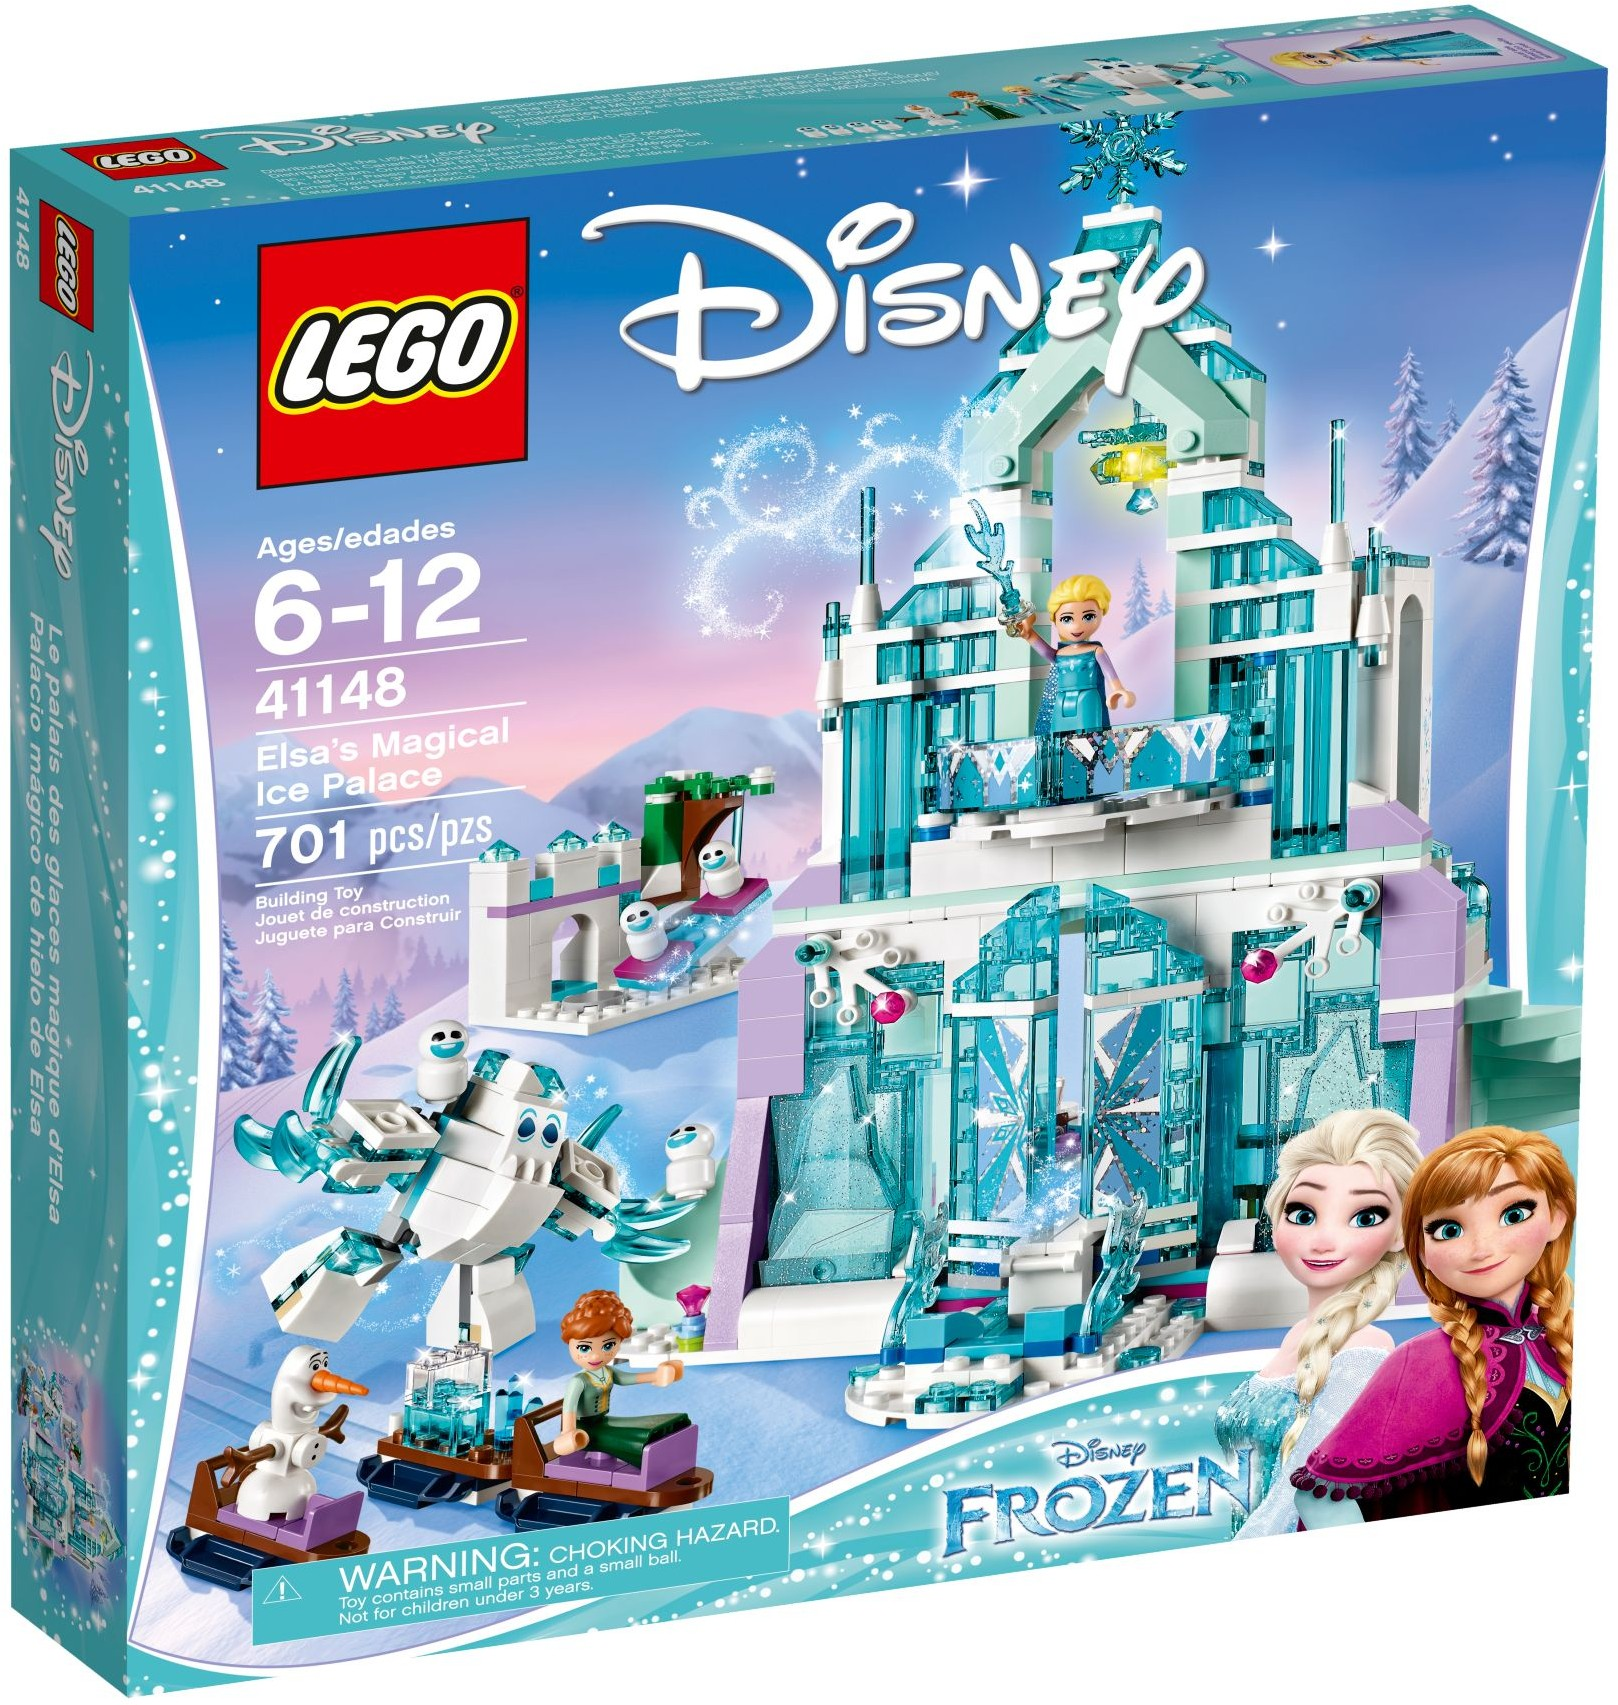 41148 LEGO Disney Princess Elsa's Magical Ice Palace